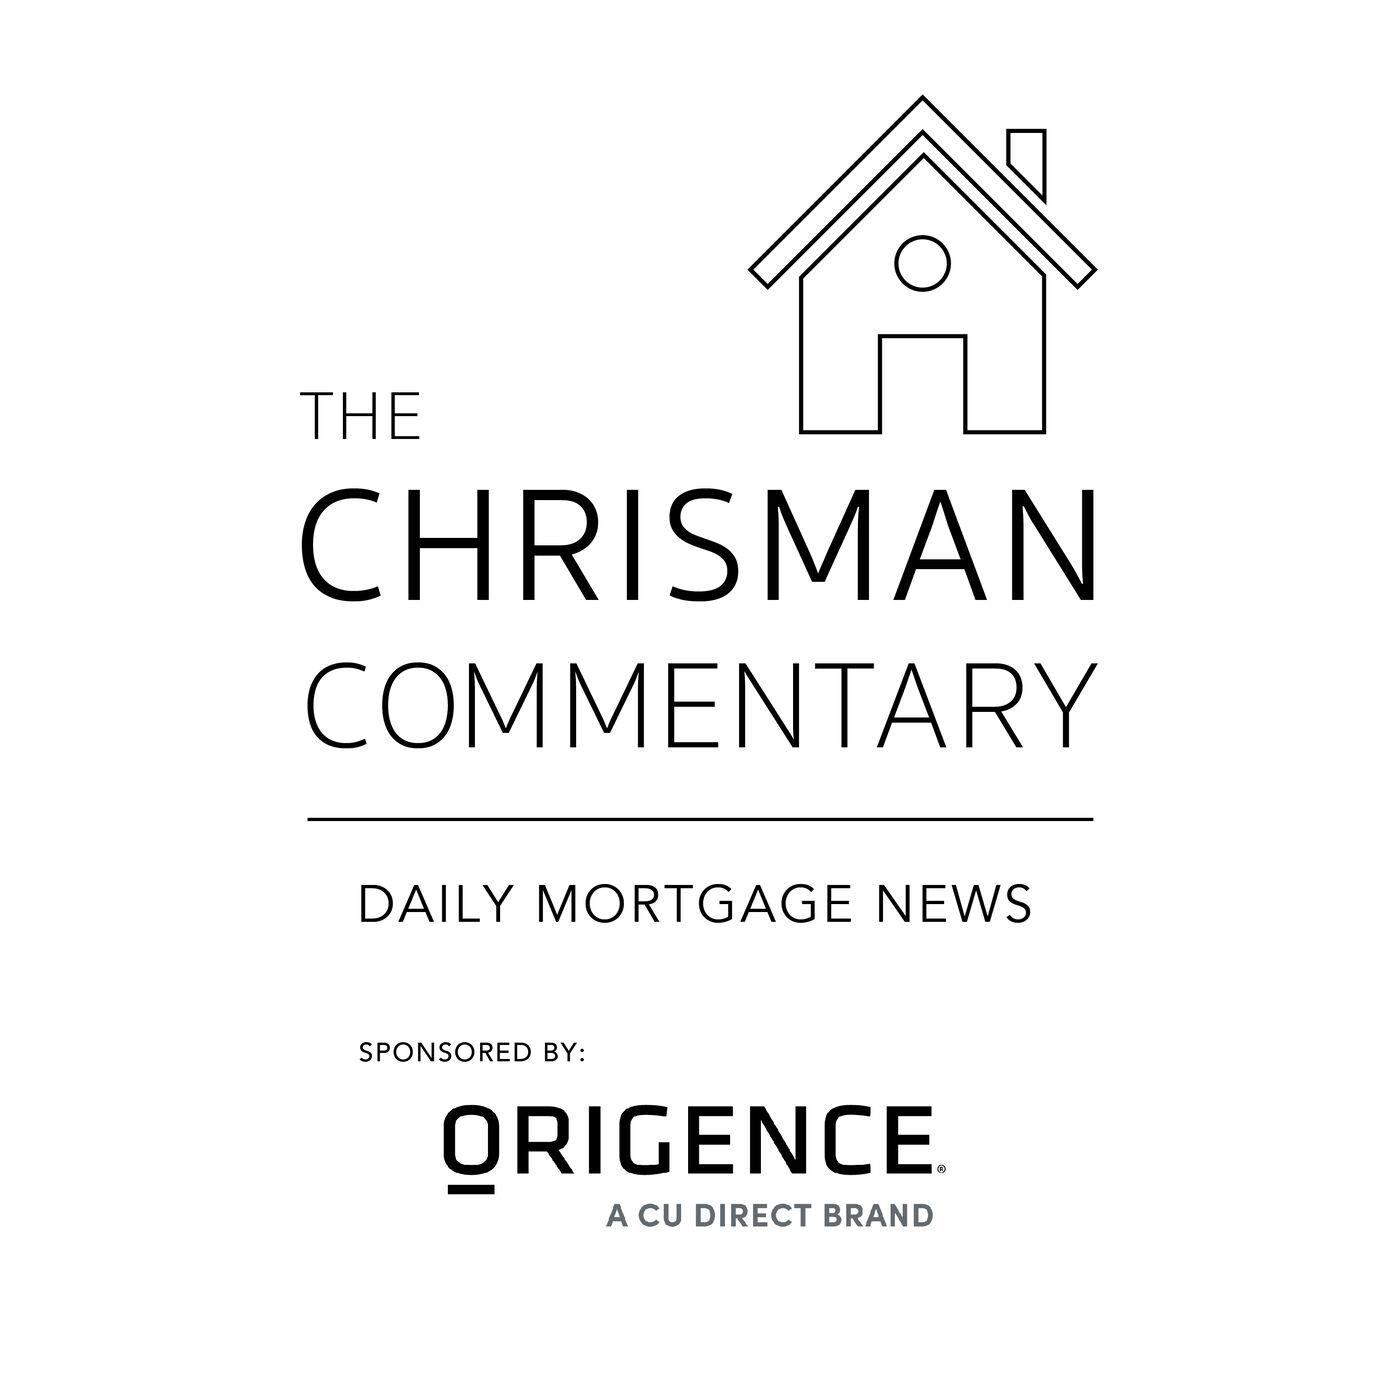 9.15.21 FHFA PSPA Changes (love thy acronyms); Rob Chrisman Q&A on Fannie and Freddie Future